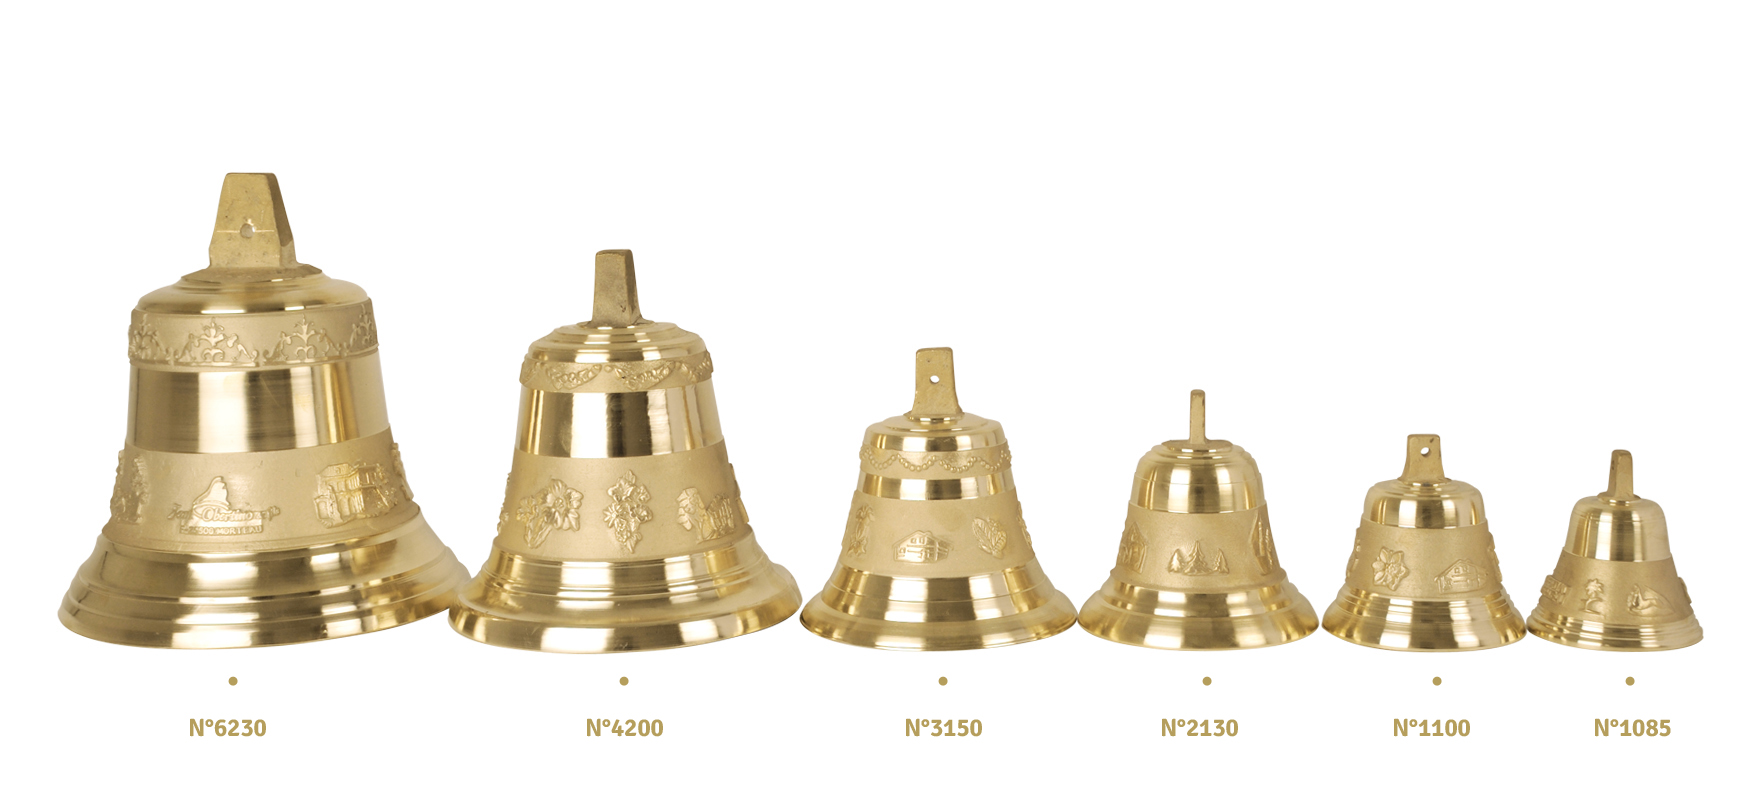 Naked bell